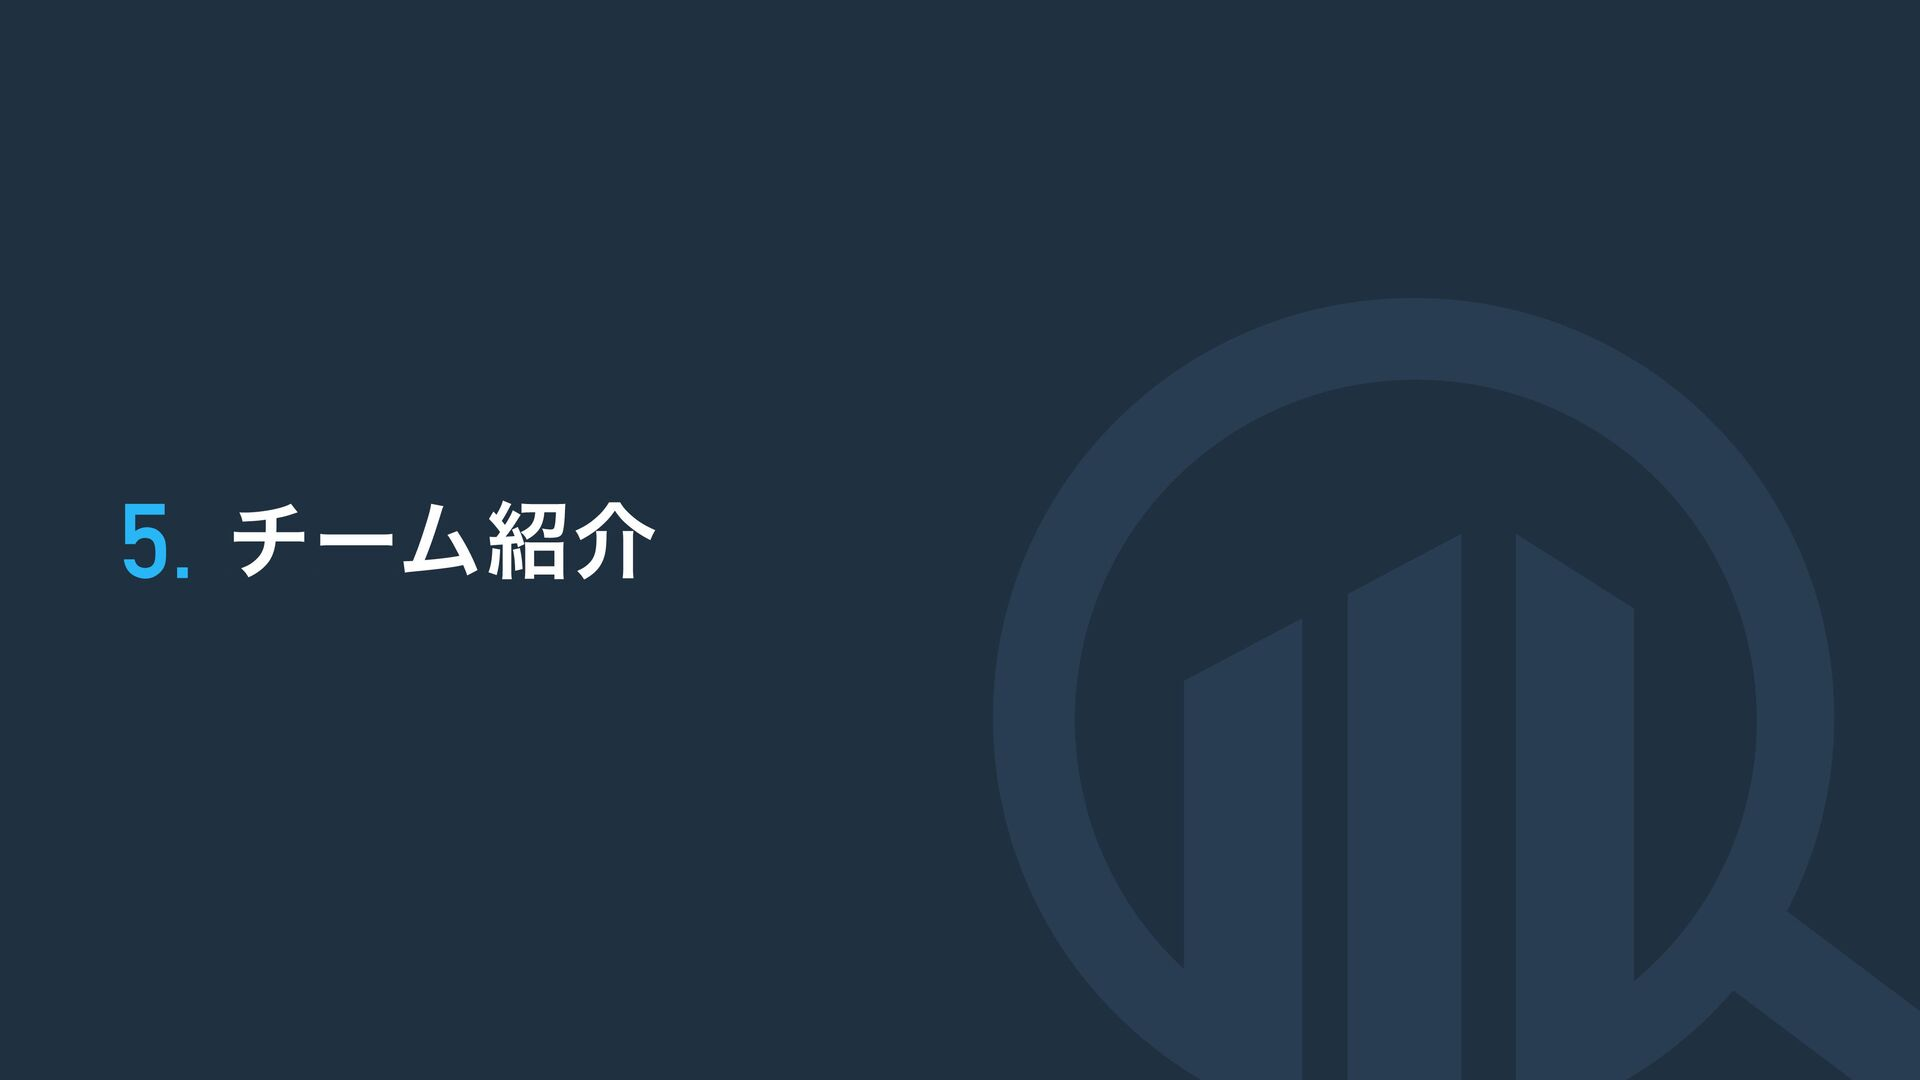 CEOとCTOの紹介 平井 瑛 CEO 東京大学経済学部卒業後、三菱地所入社。  米国/欧州/...